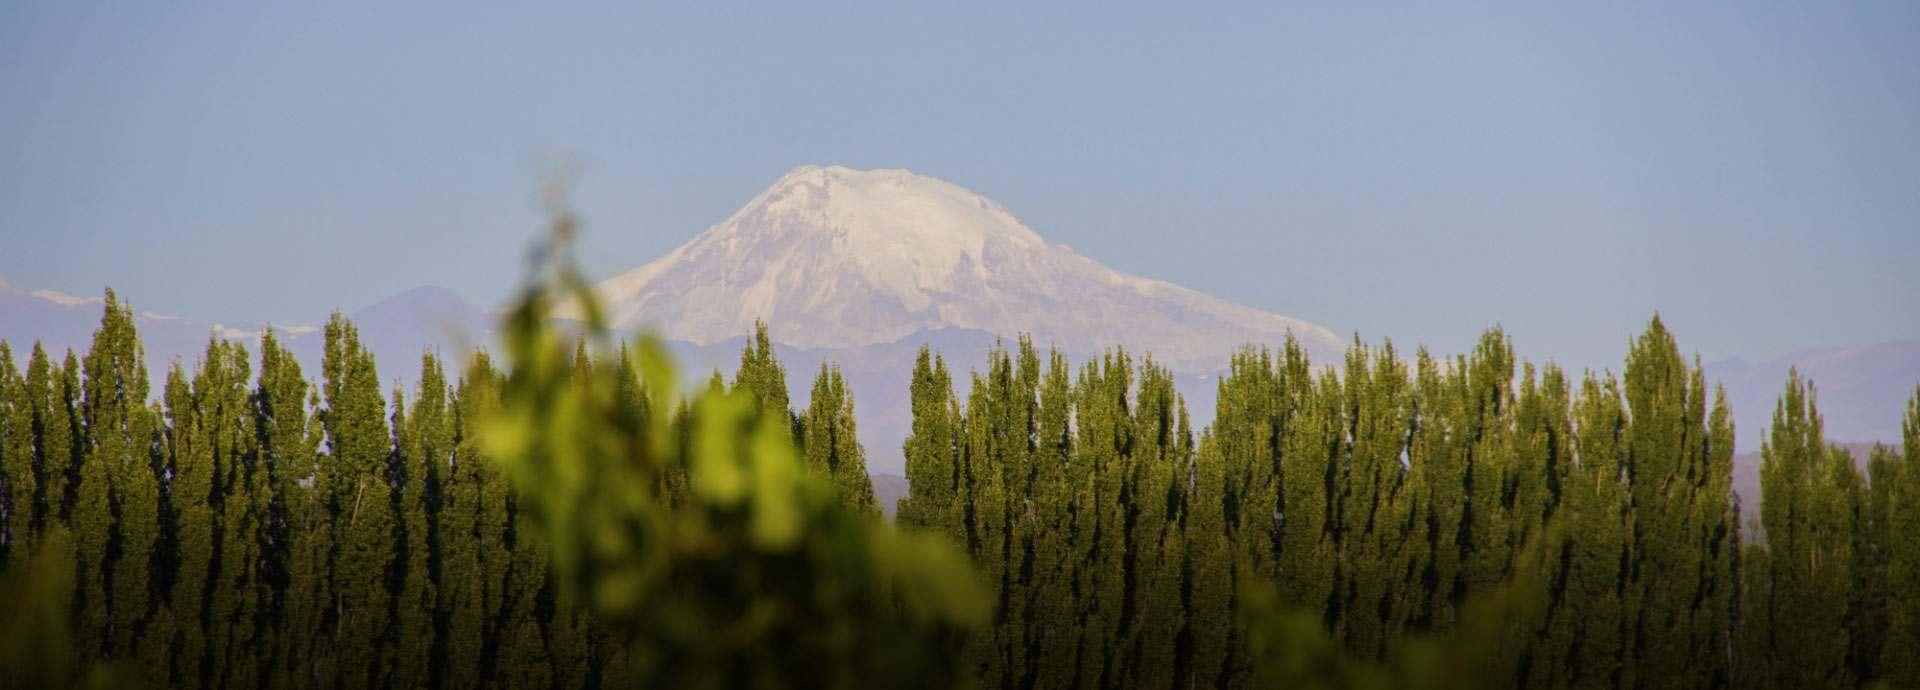 Mendoza Vineyards banner image